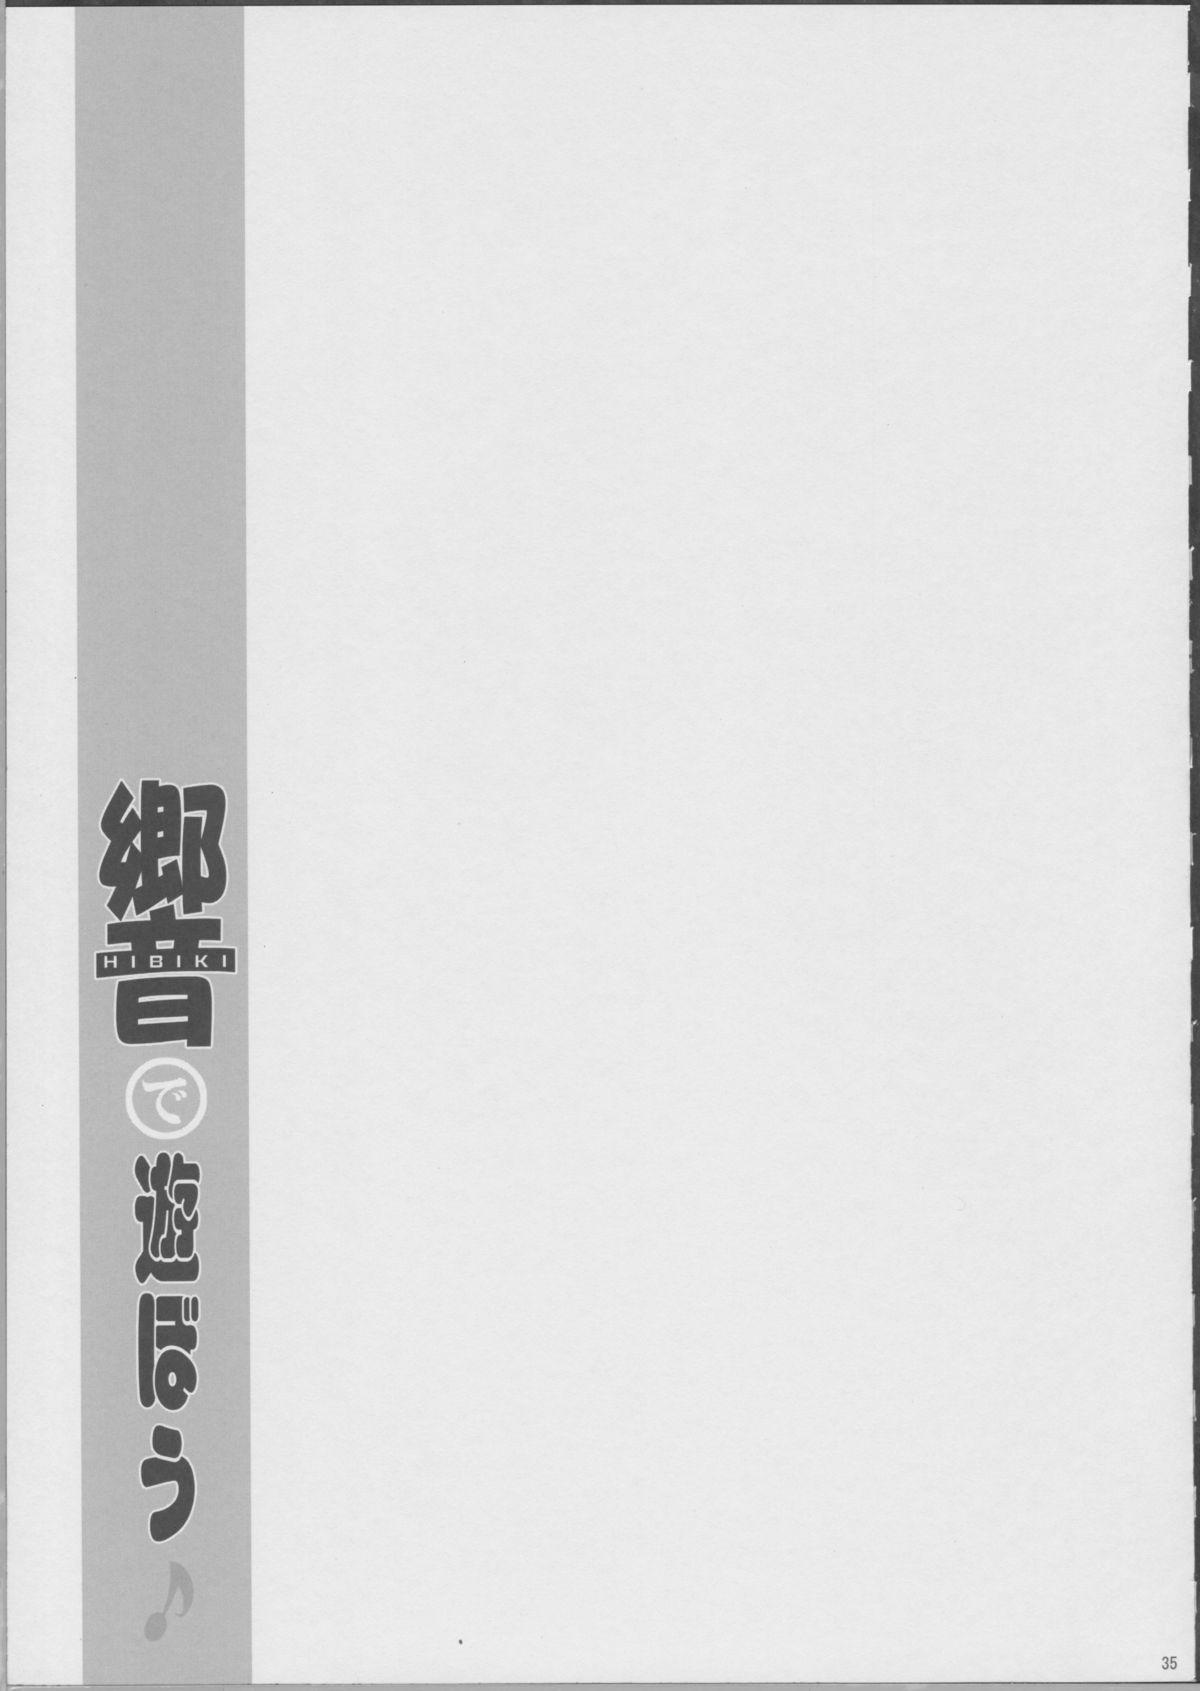 Hibiki de asobou ♪ 33